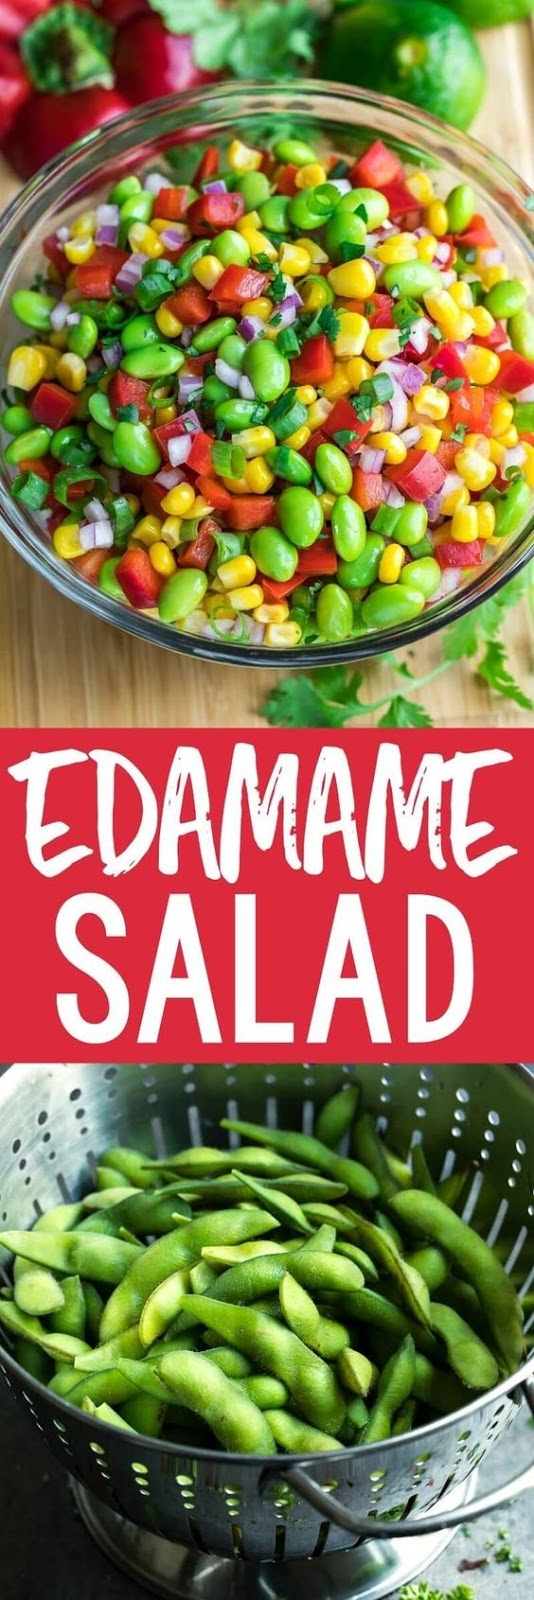 Edamame Salad With Cilantro Lime Dressing